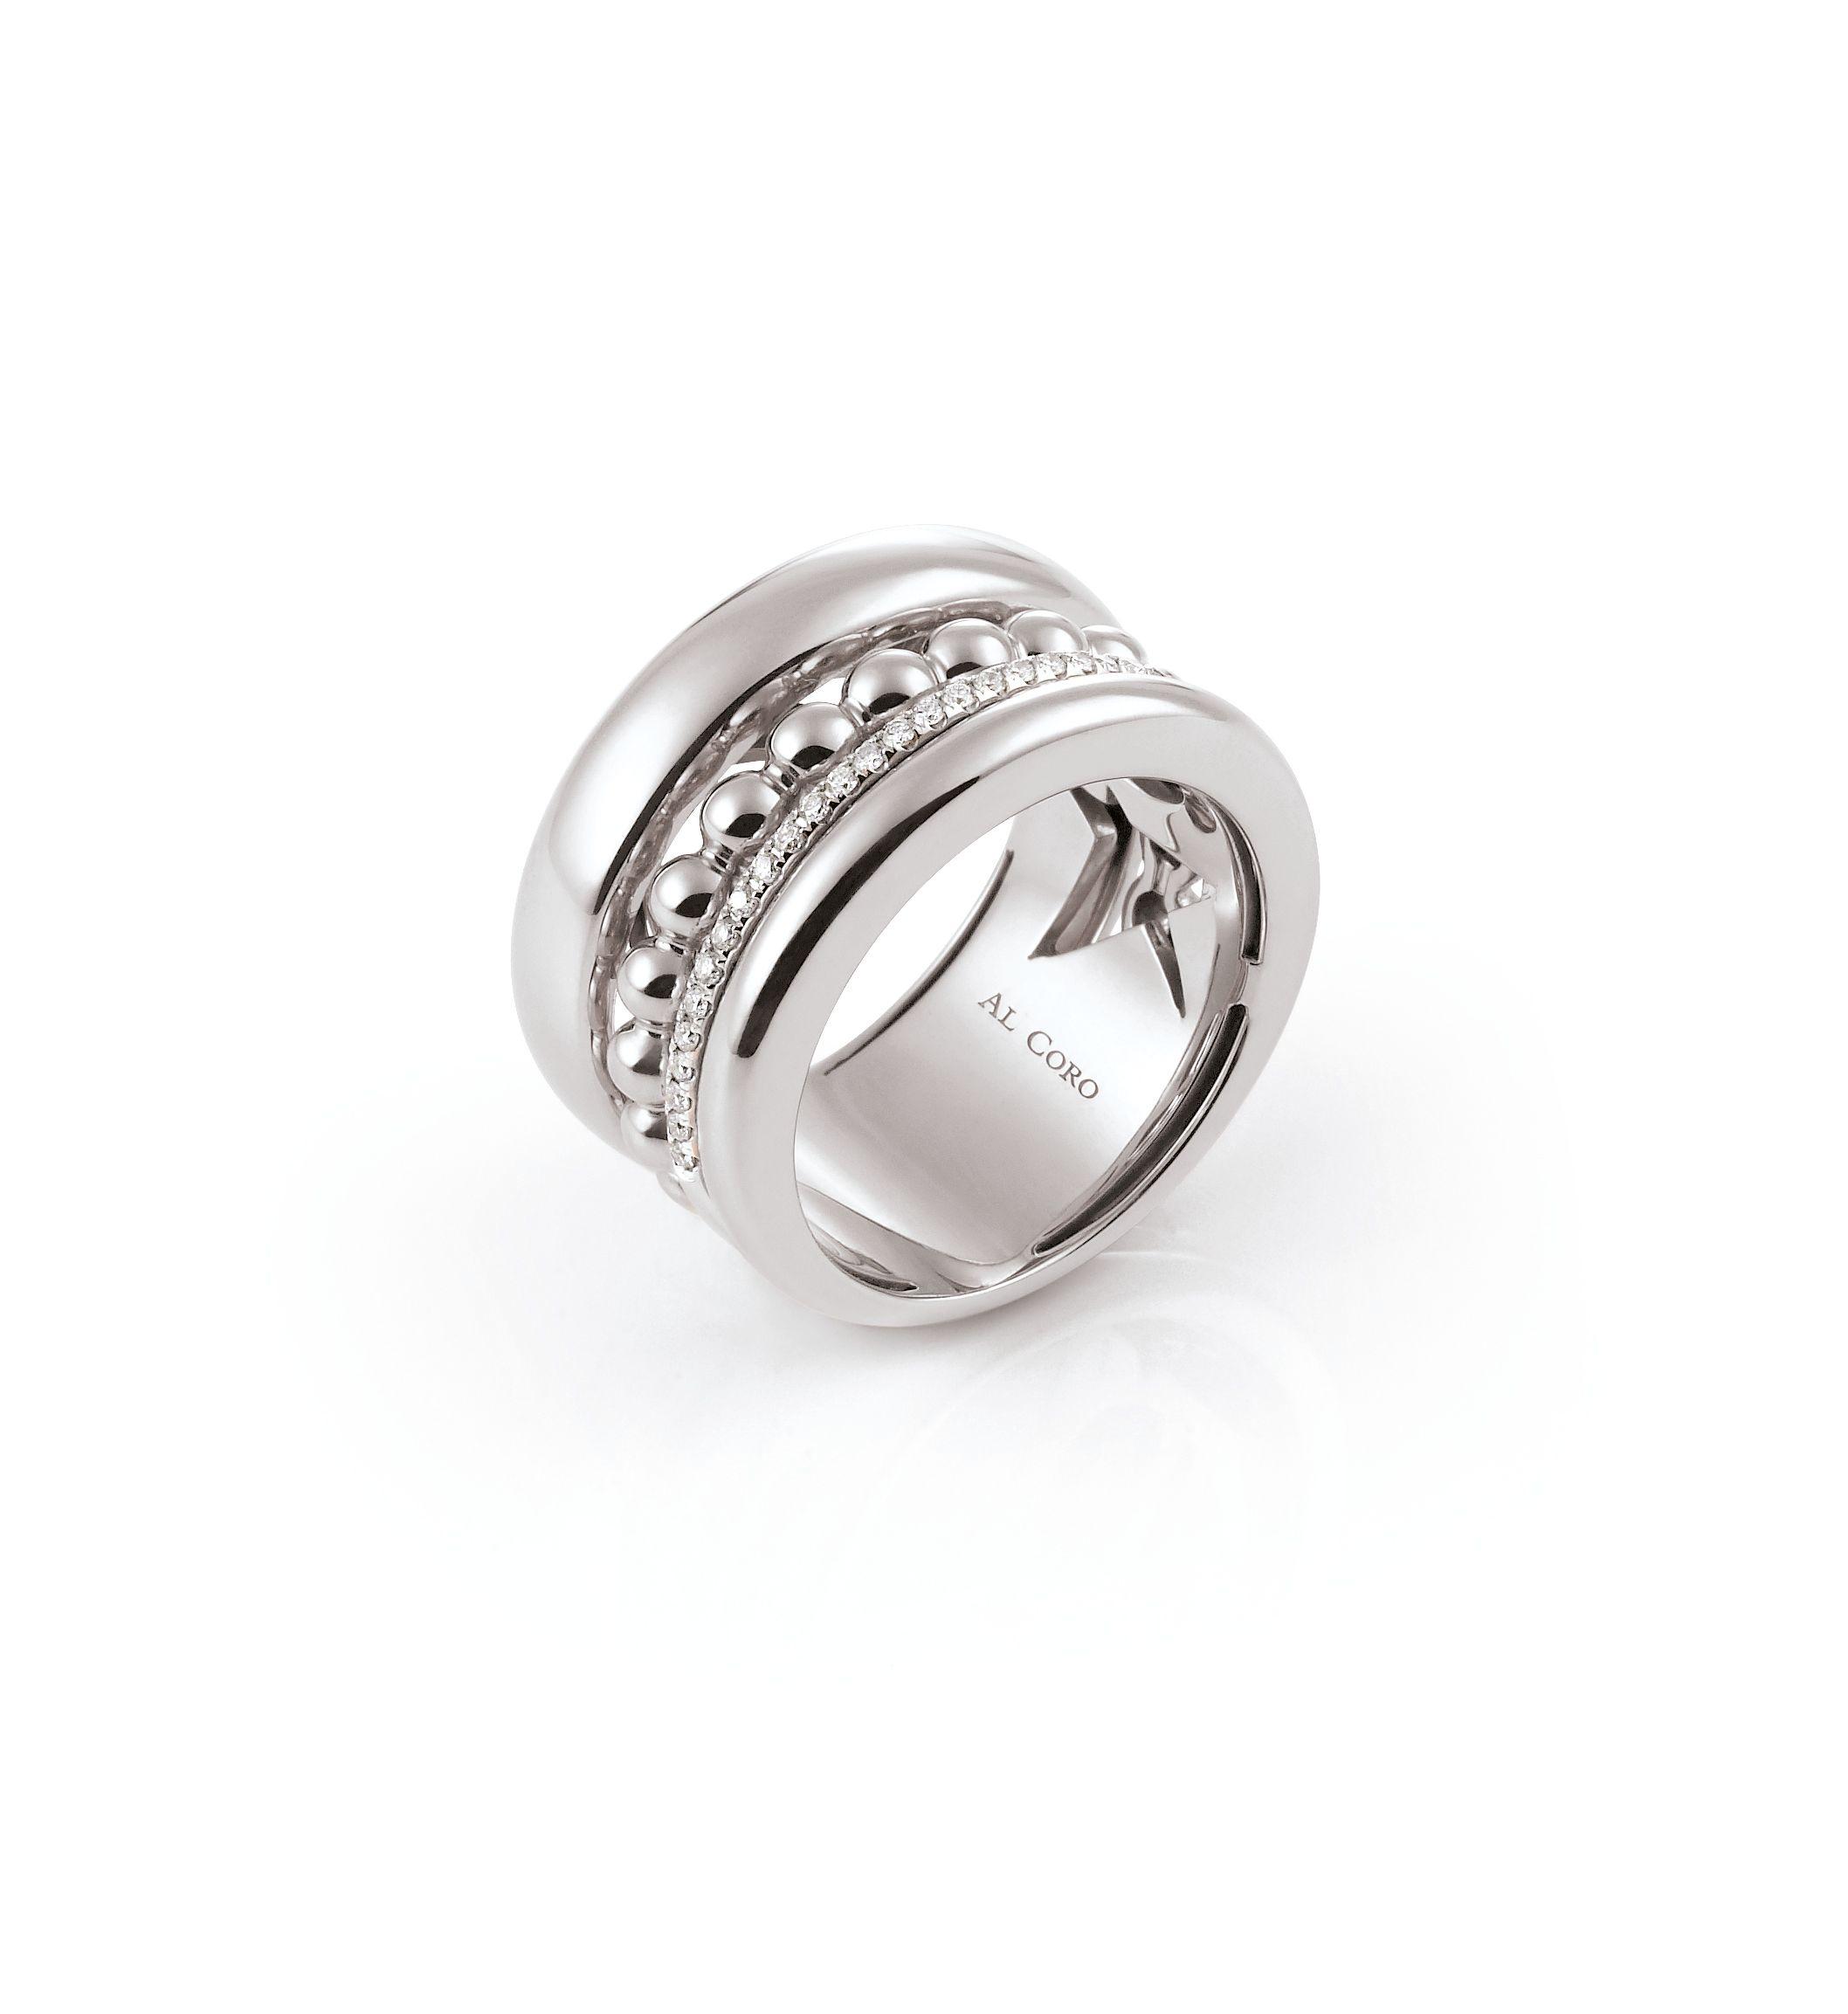 AL CORO Ring